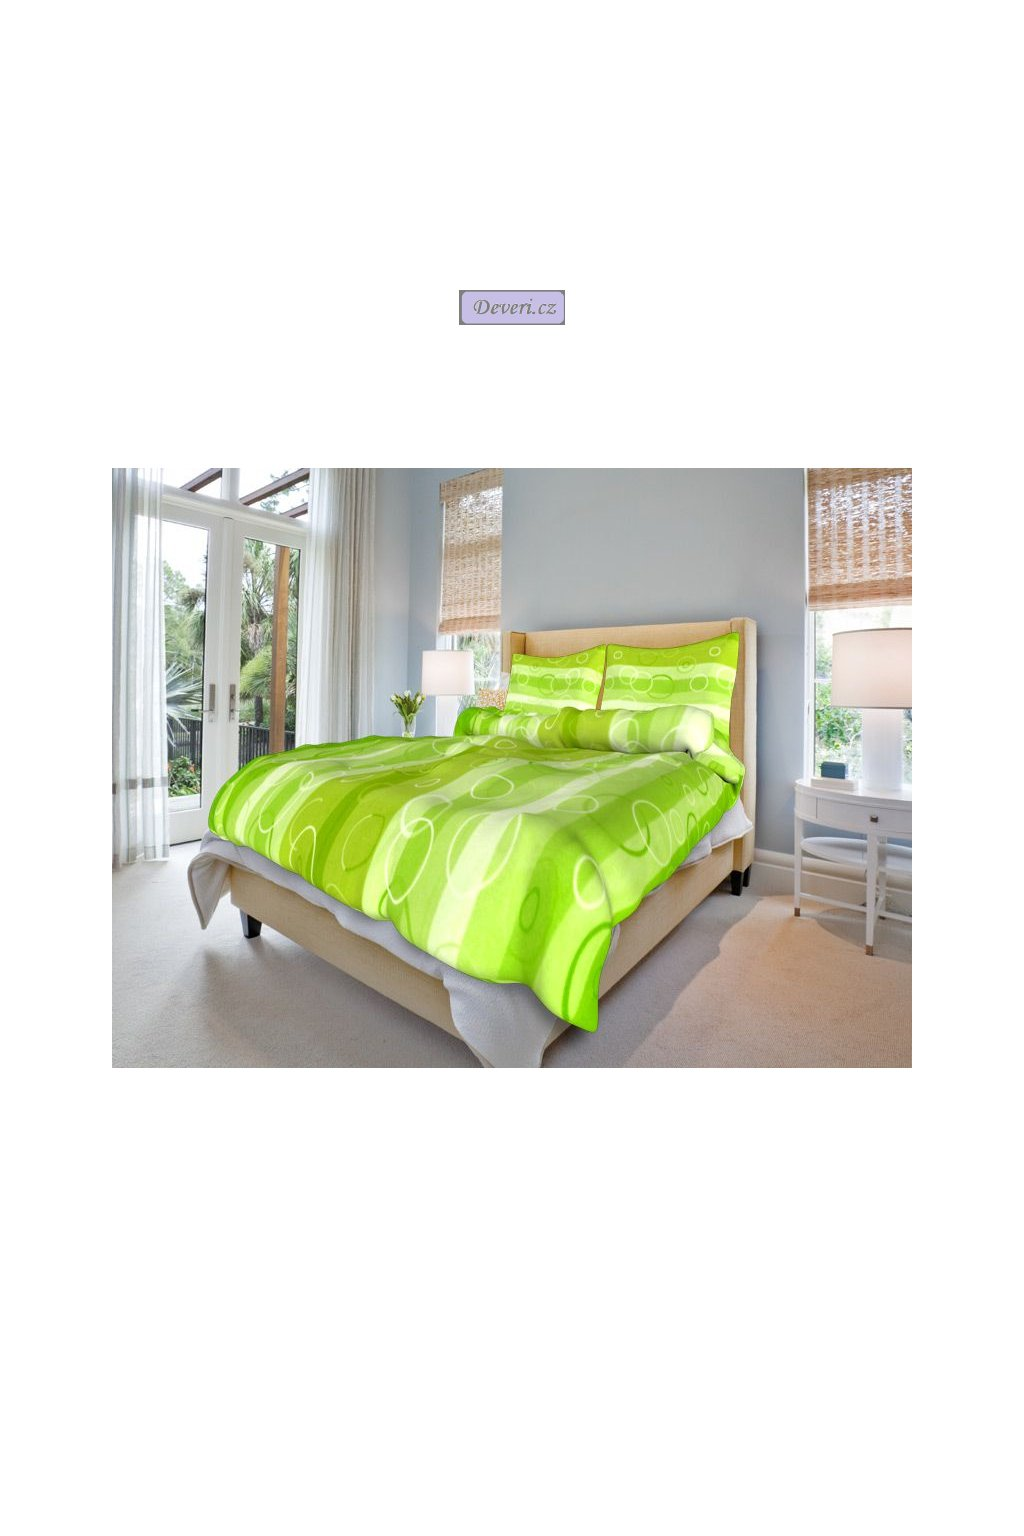 bavlnene povleceni kola zelene 0